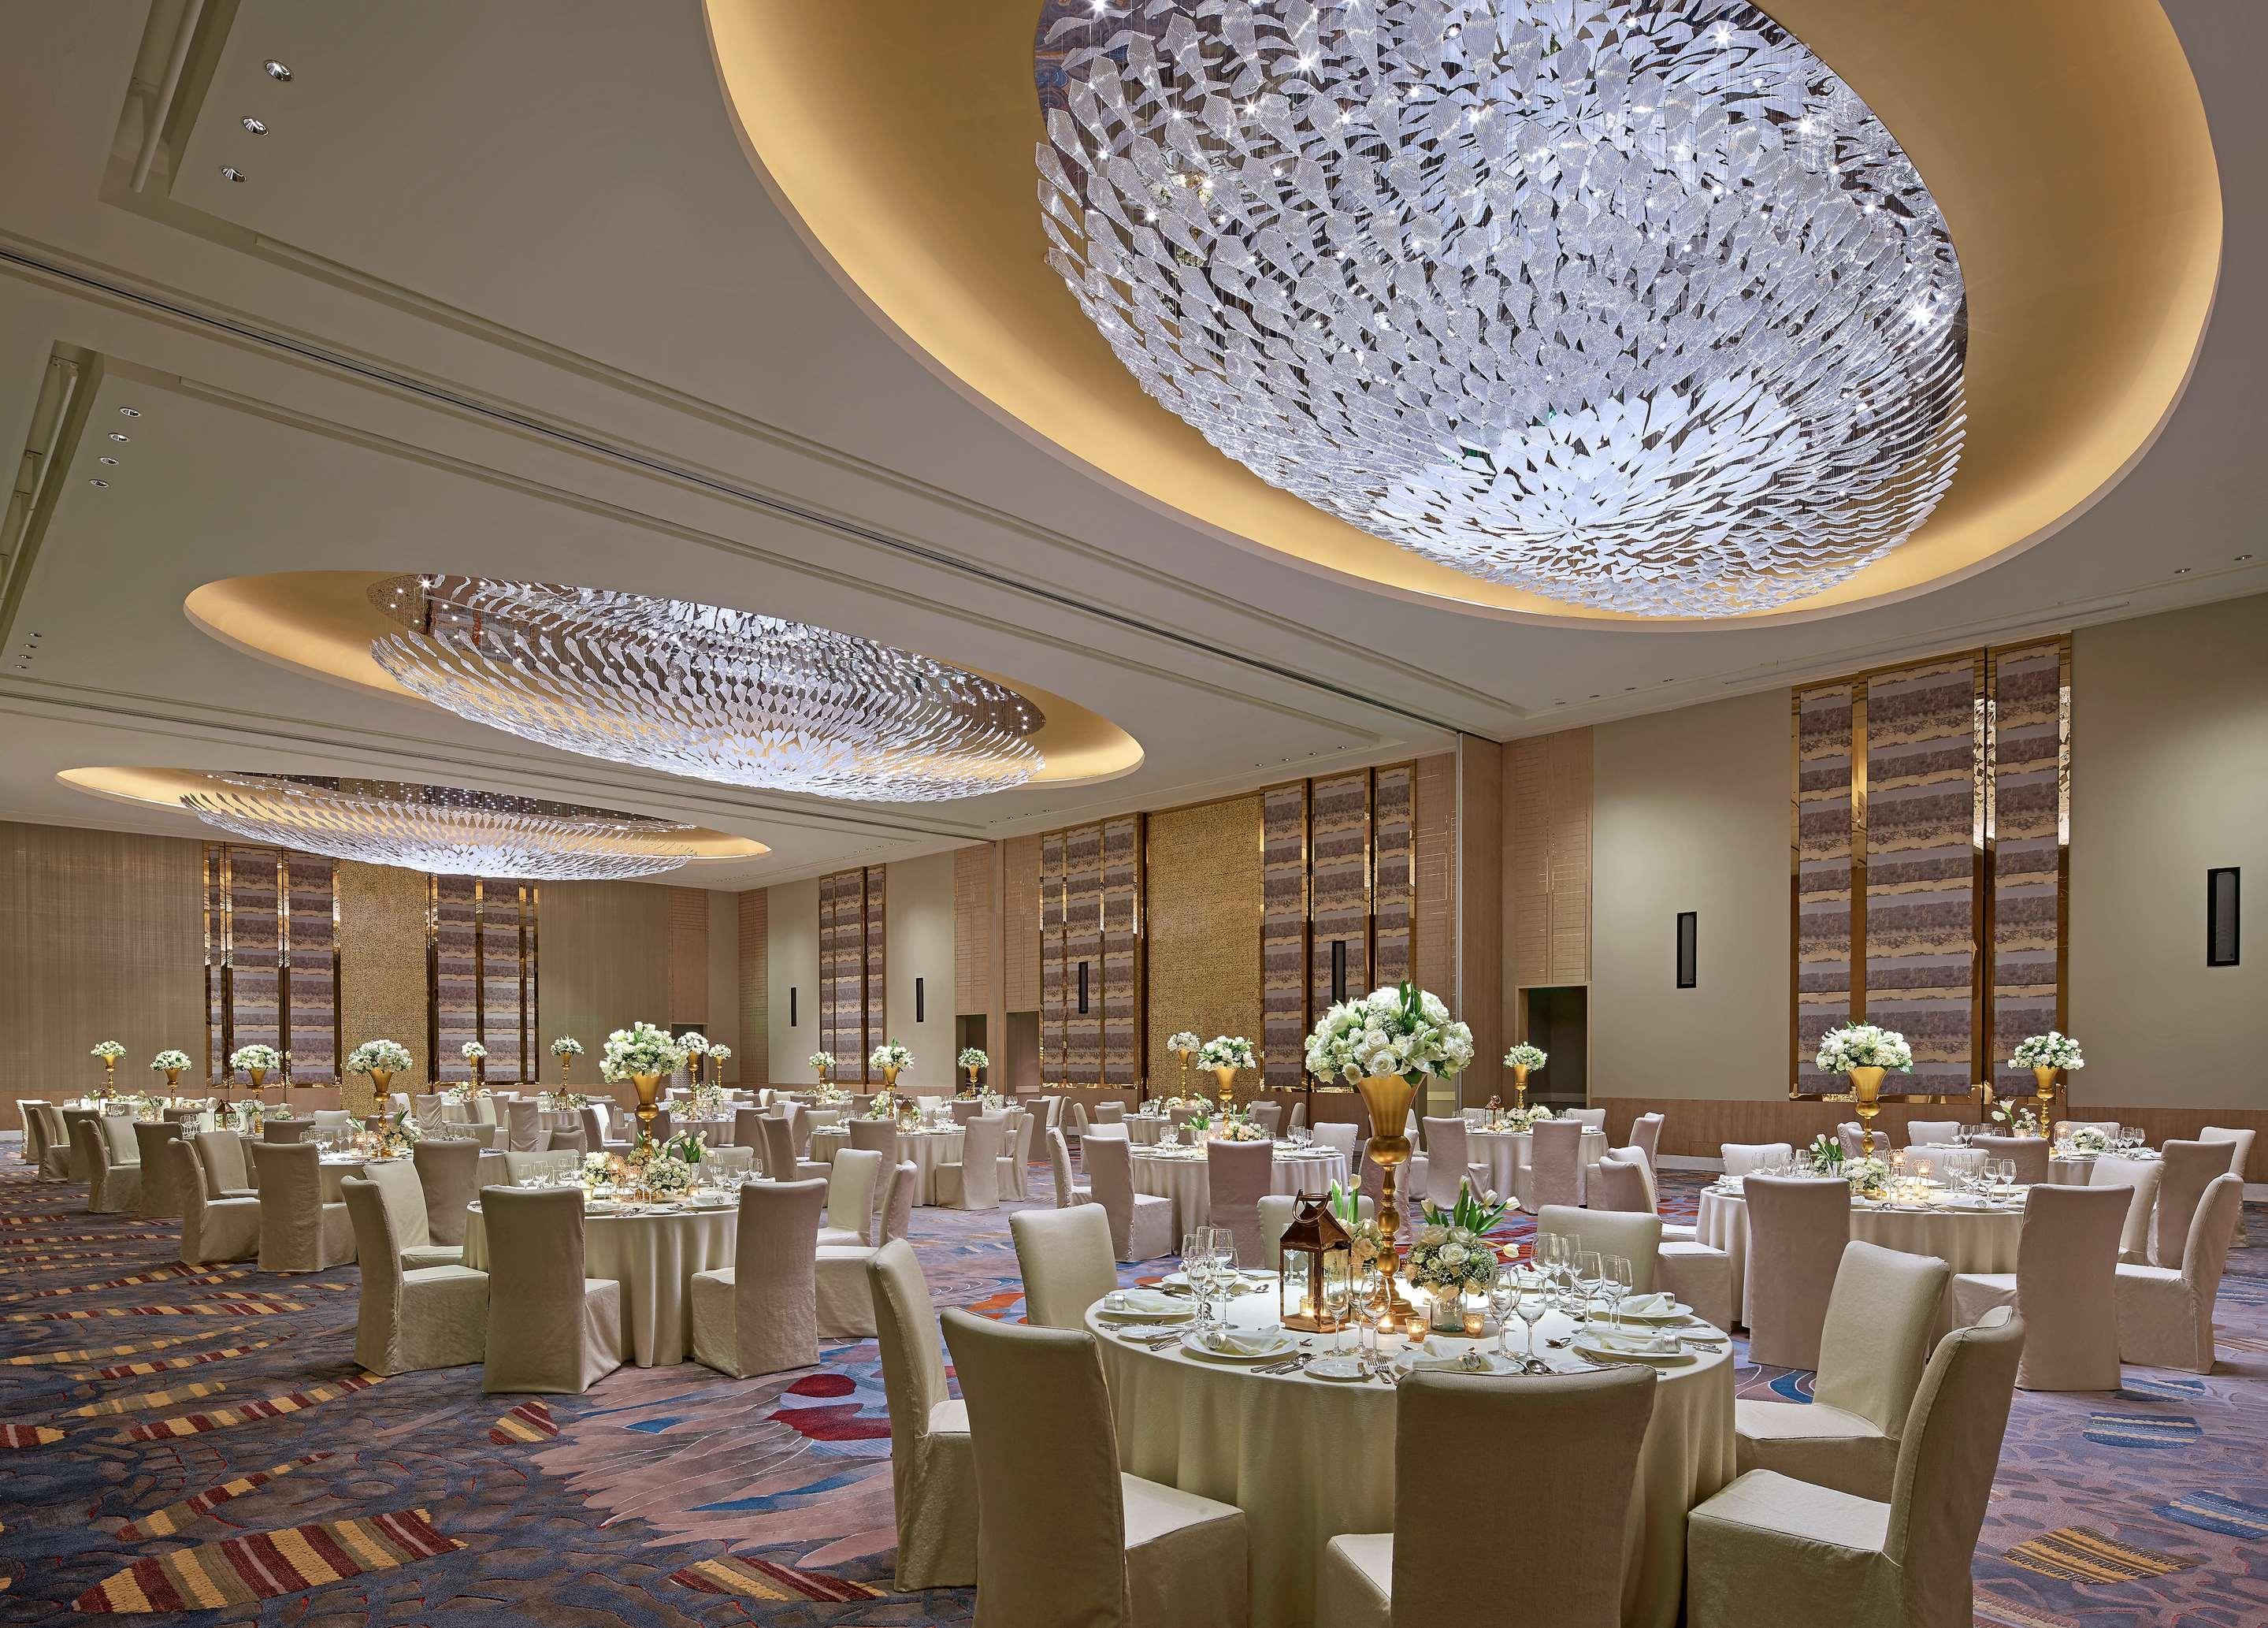 Shangri La At The Fort Manila 199 4 0 6 Taguig Hotel